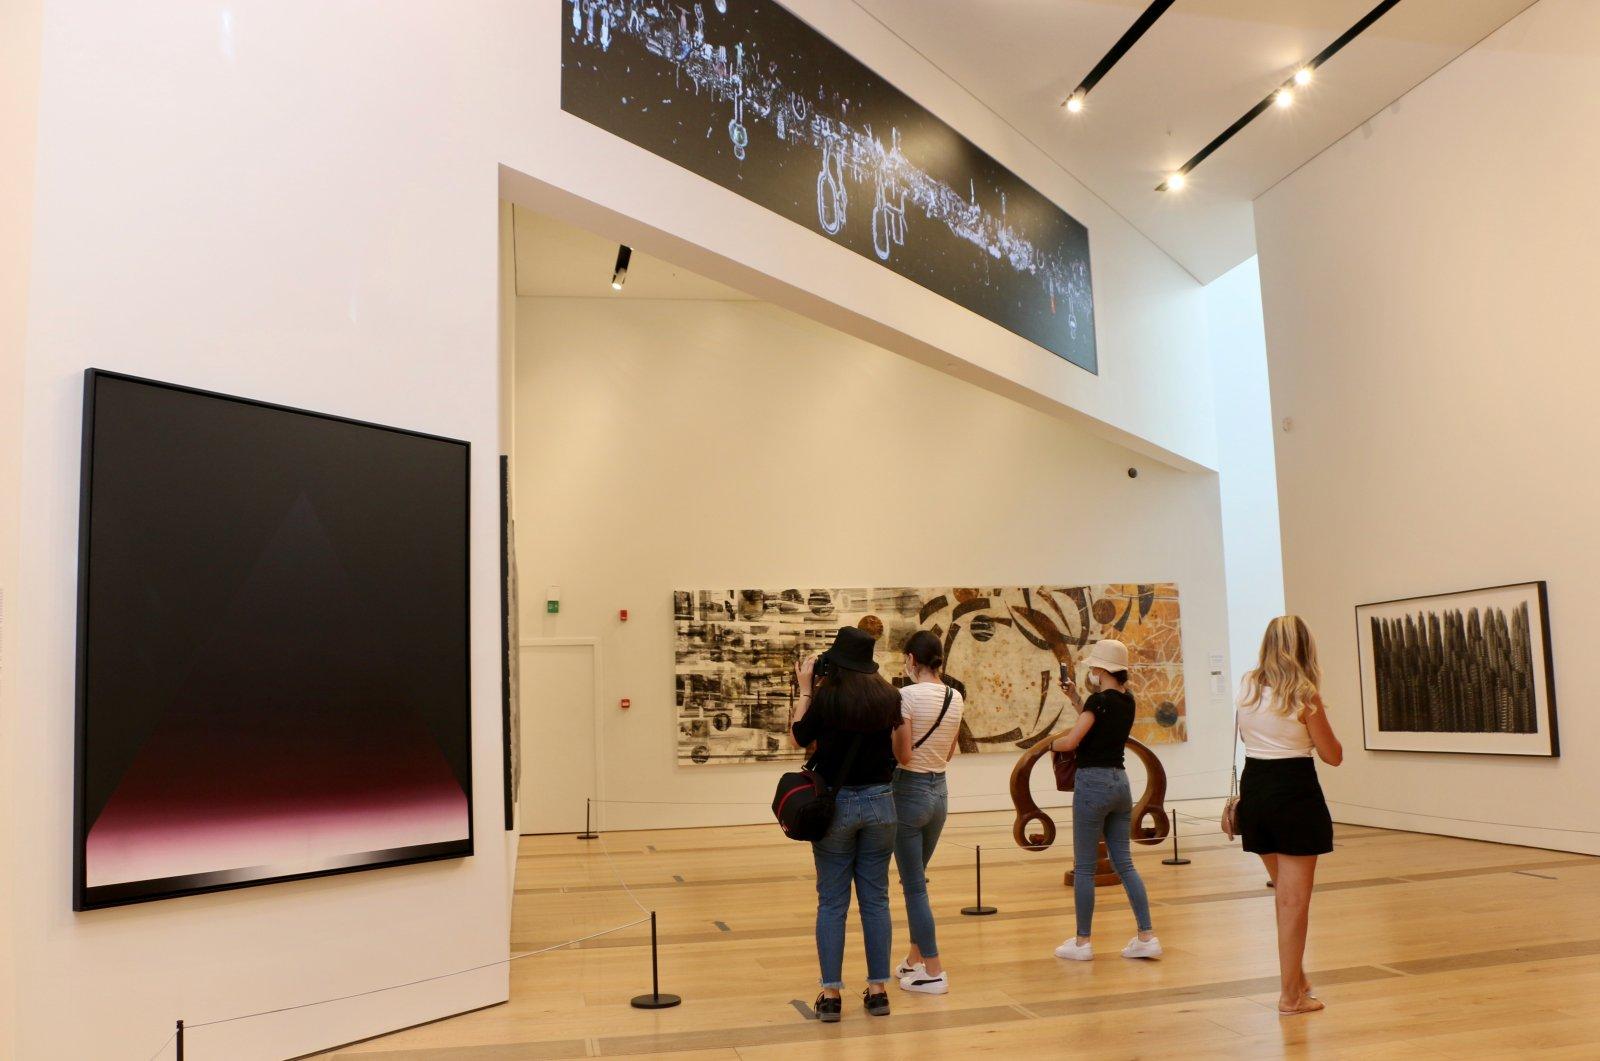 Visitors are seen at Odunpazarı Modern Museum in Eskişehir, central Turkey, Aug. 24, 2020. (AA Photo)